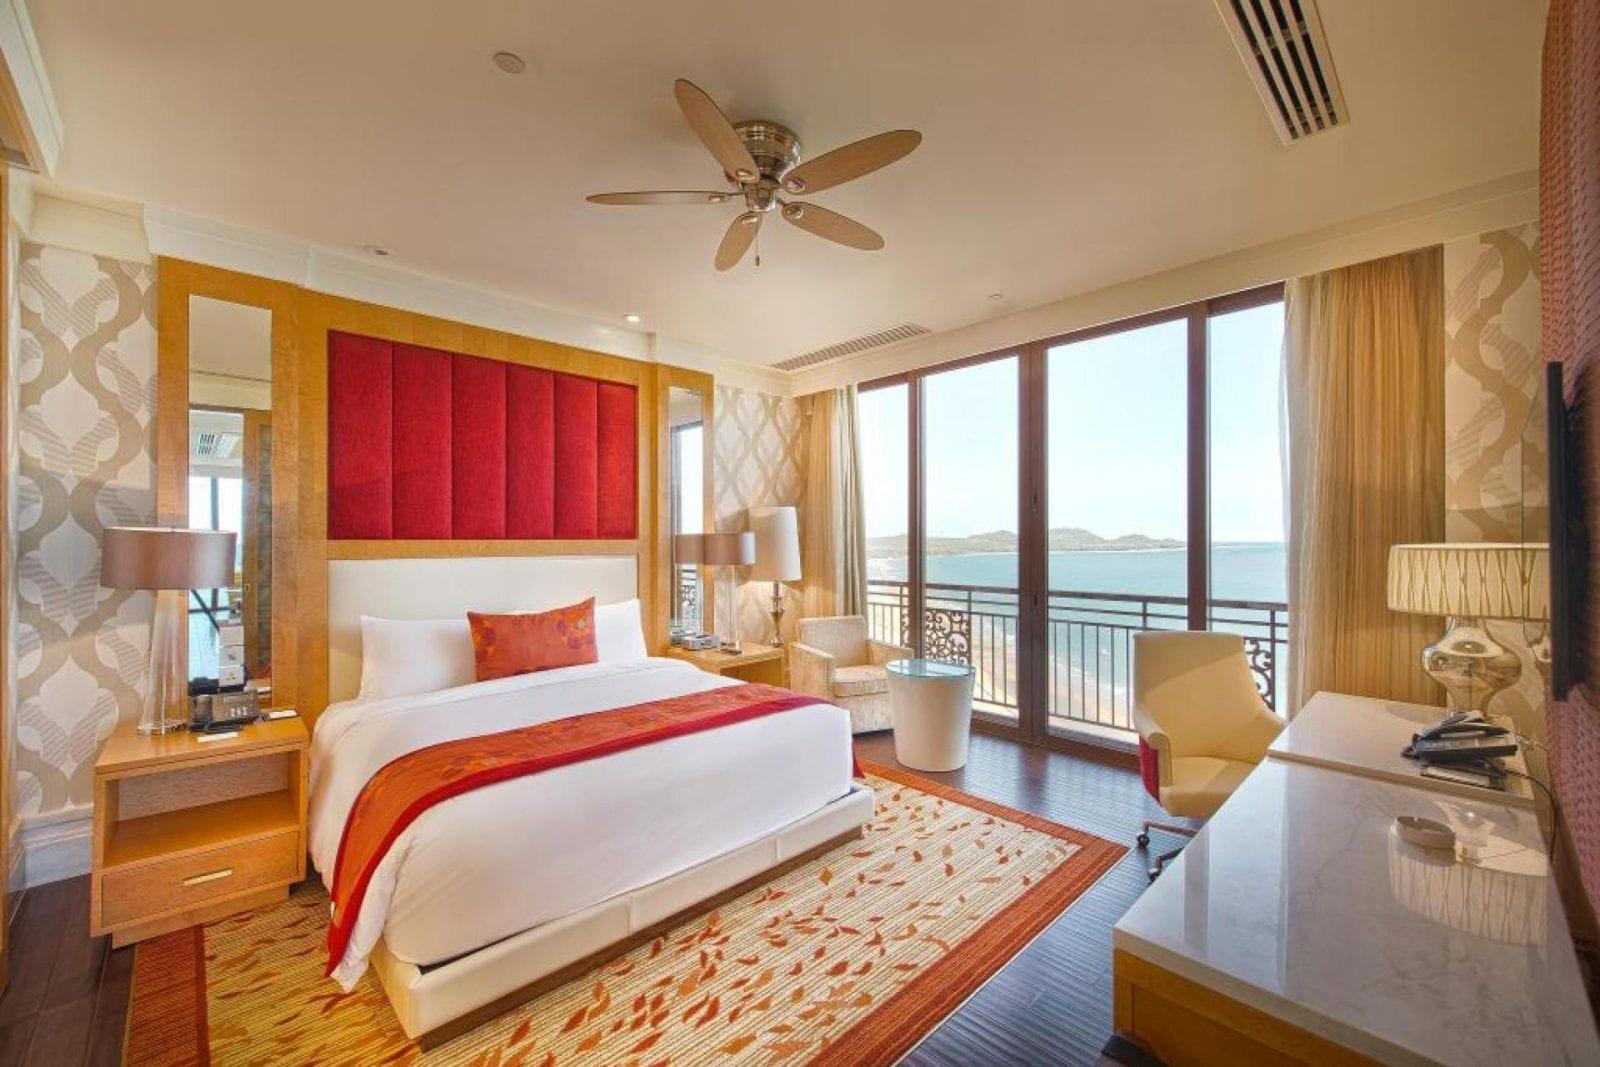 Room at The Grand Hồ Tràm Strip